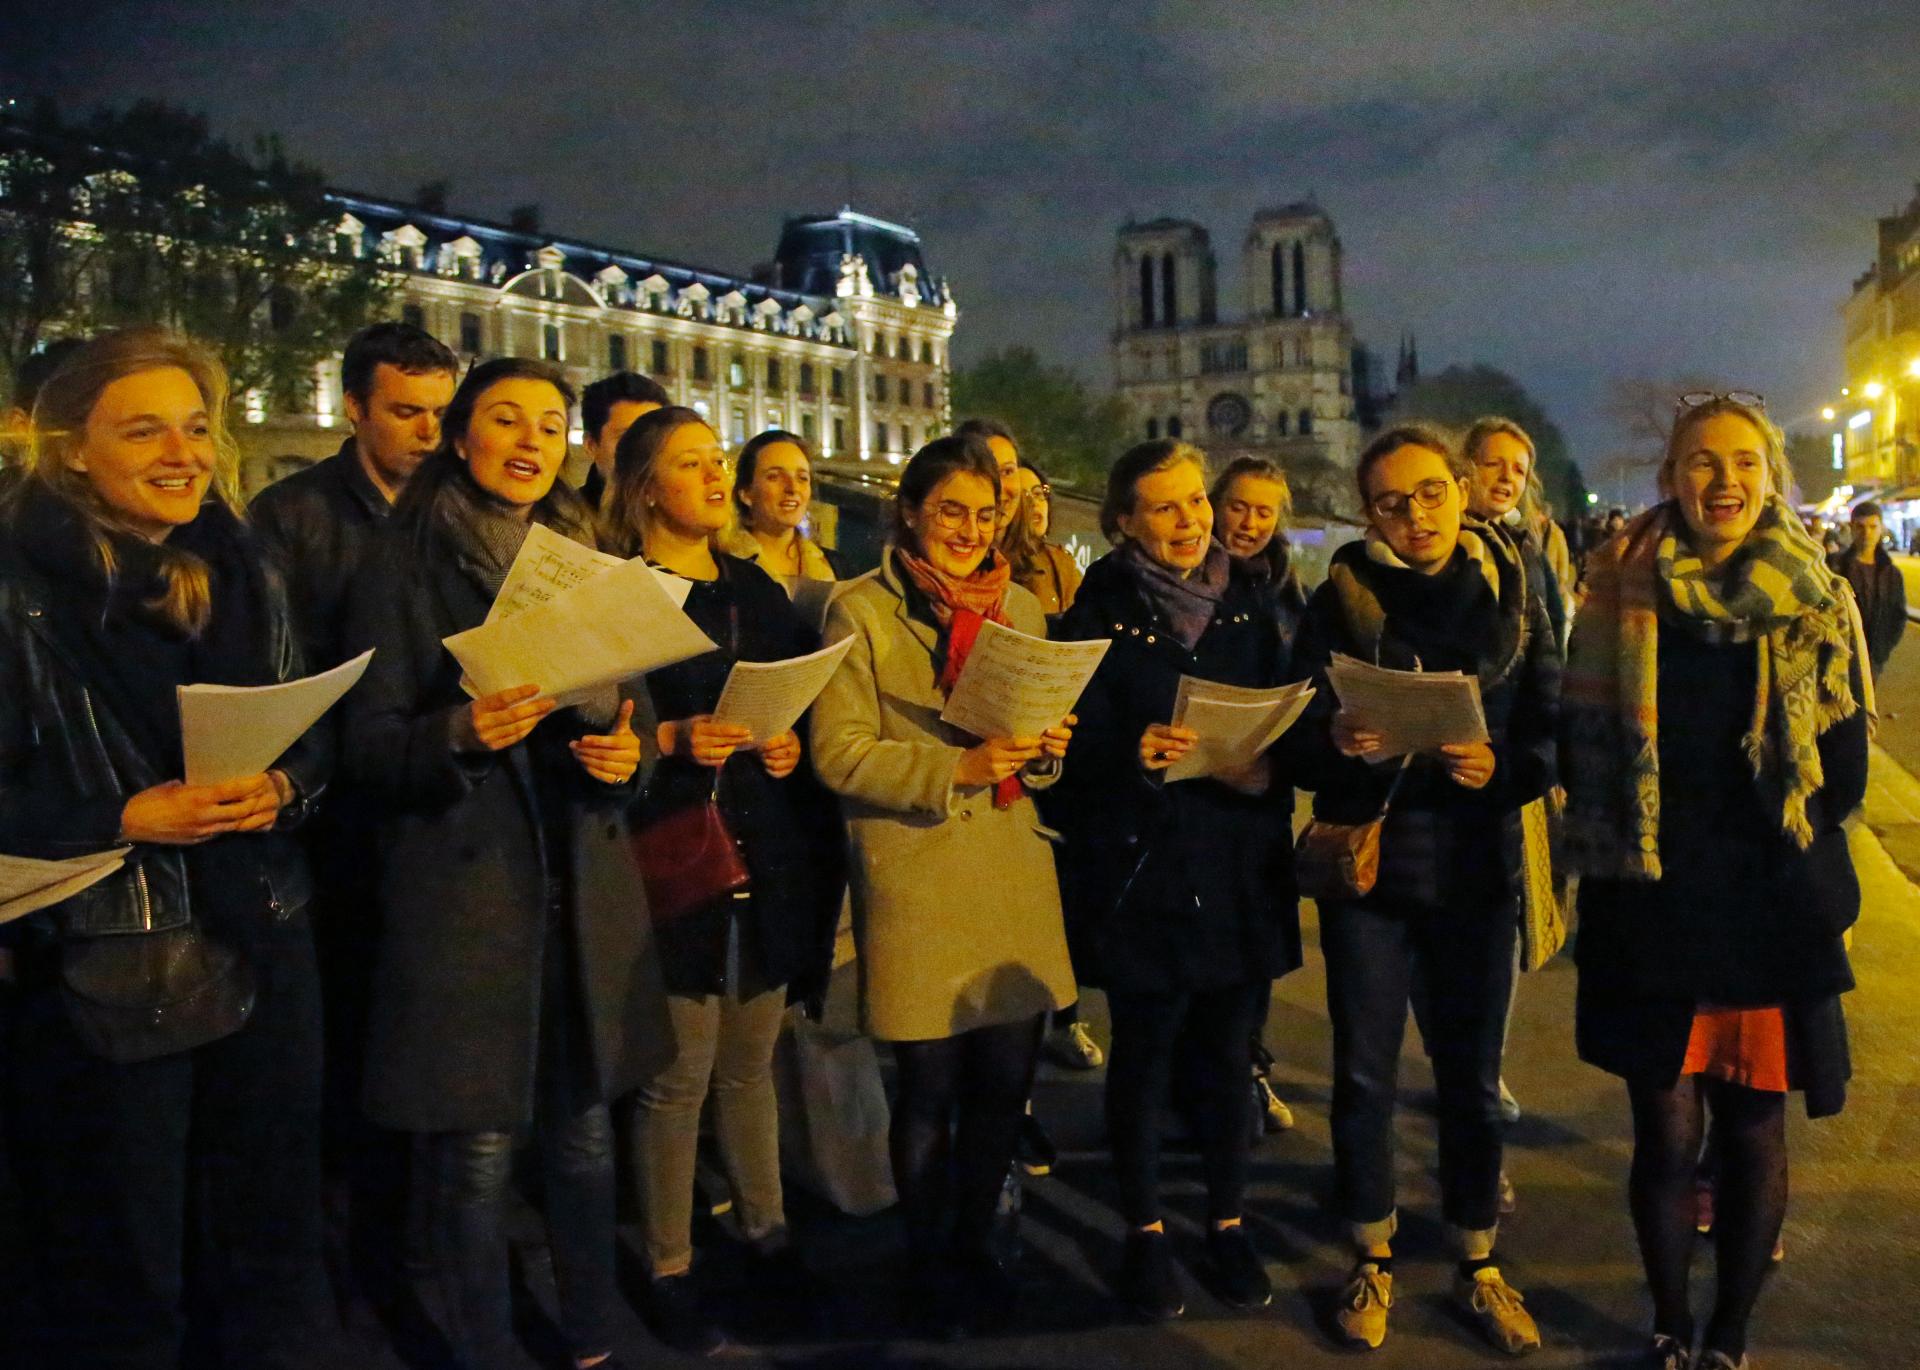 Westlake Legal Group ContentBroker_contentid-1f16f27ac0734c15b94140b71bd9799e $1 billion raised to rebuild Paris' Notre Dame after fire Paris fox-news/world/world-regions/europe fox-news/world fnc/world fnc Associated Press article 8e19667f-bc8b-5048-9f6c-9914eca9232d